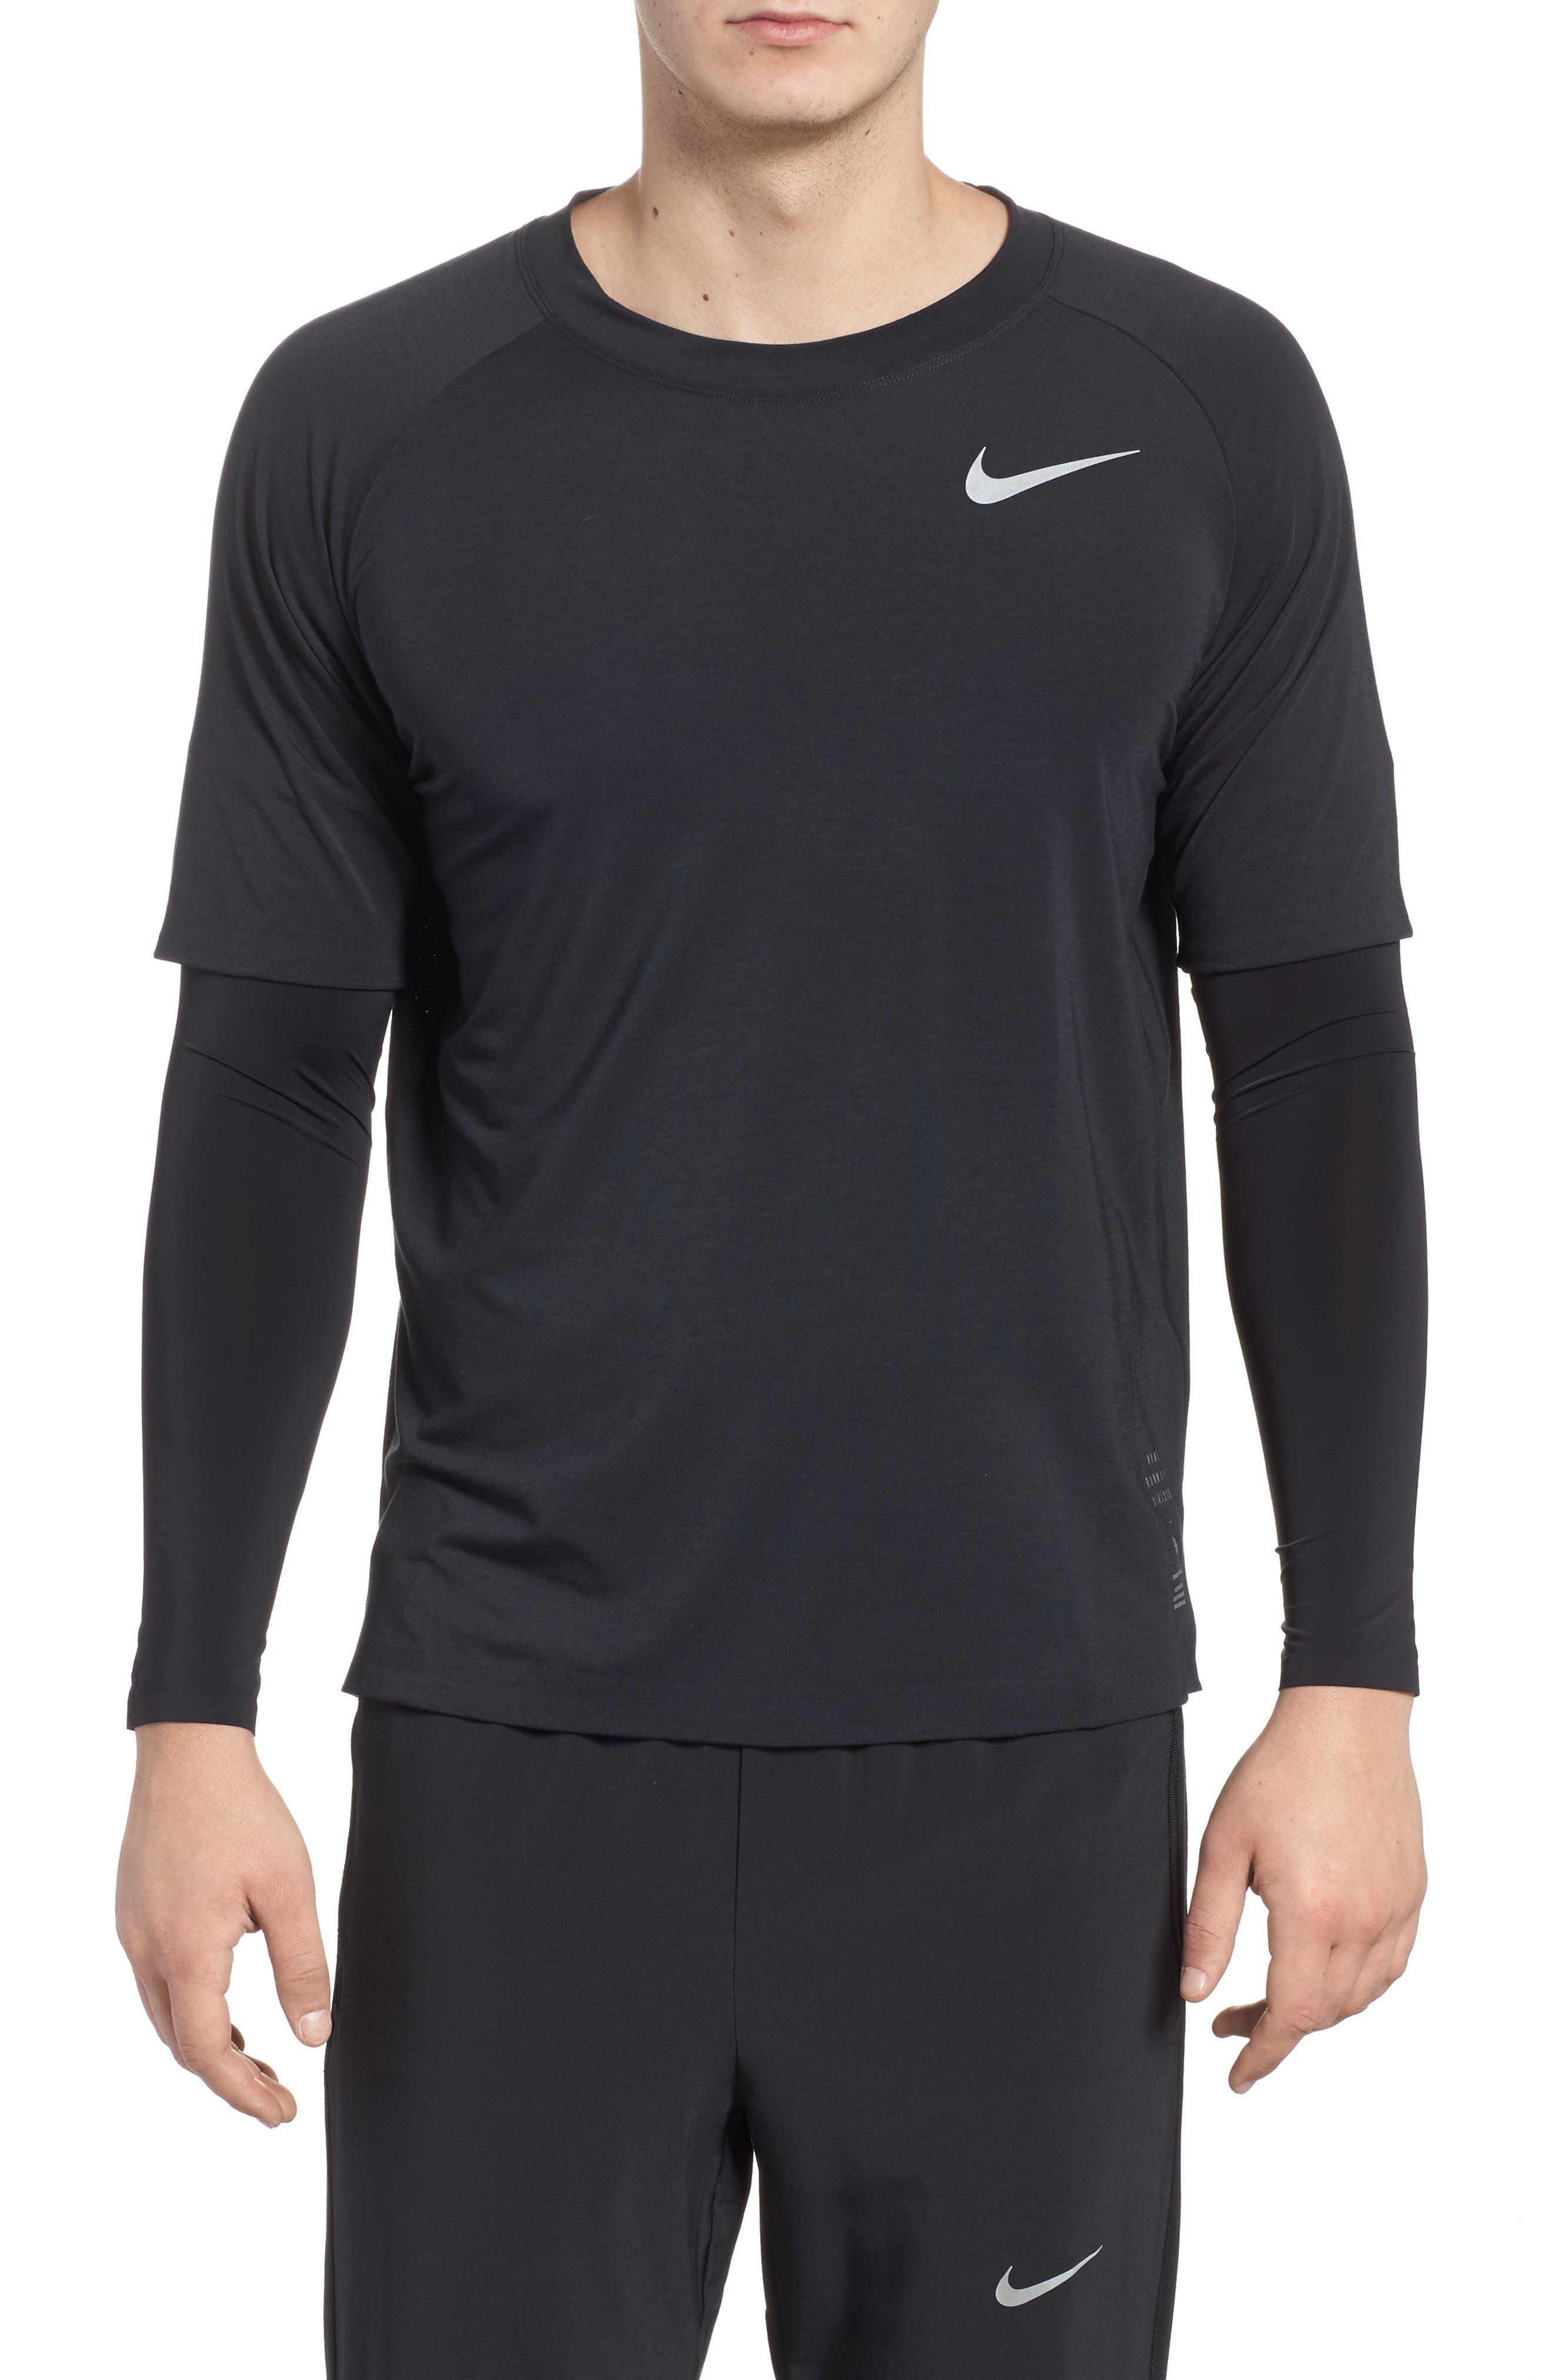 Alternate Image 1 Selected - Nike Run Division Dry Layered Long Sleeve T-Shirt